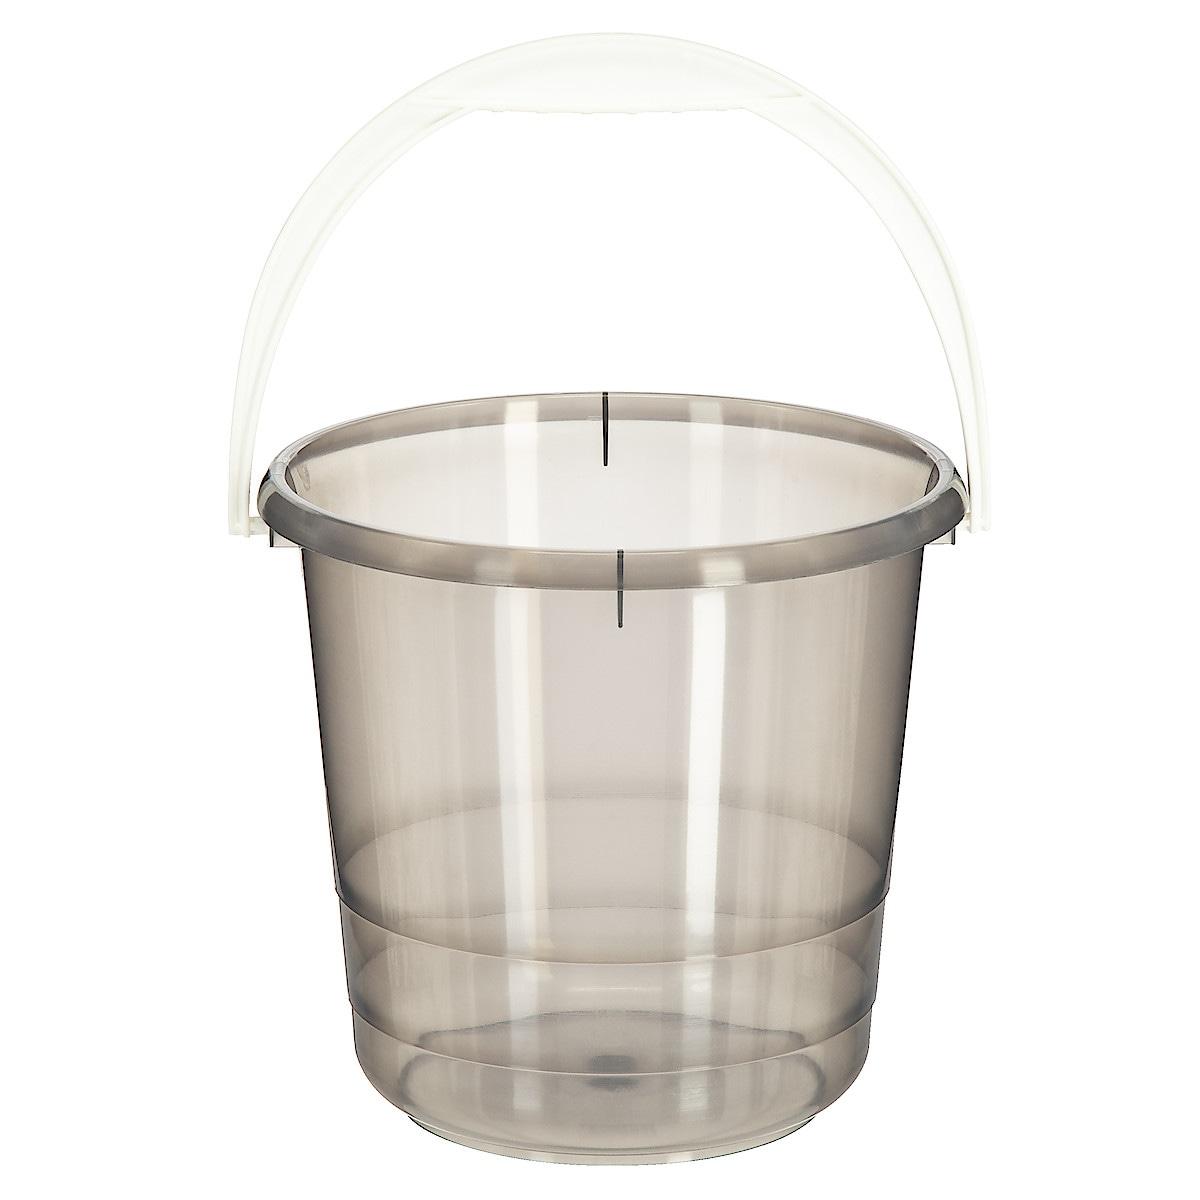 Hink 5 liter